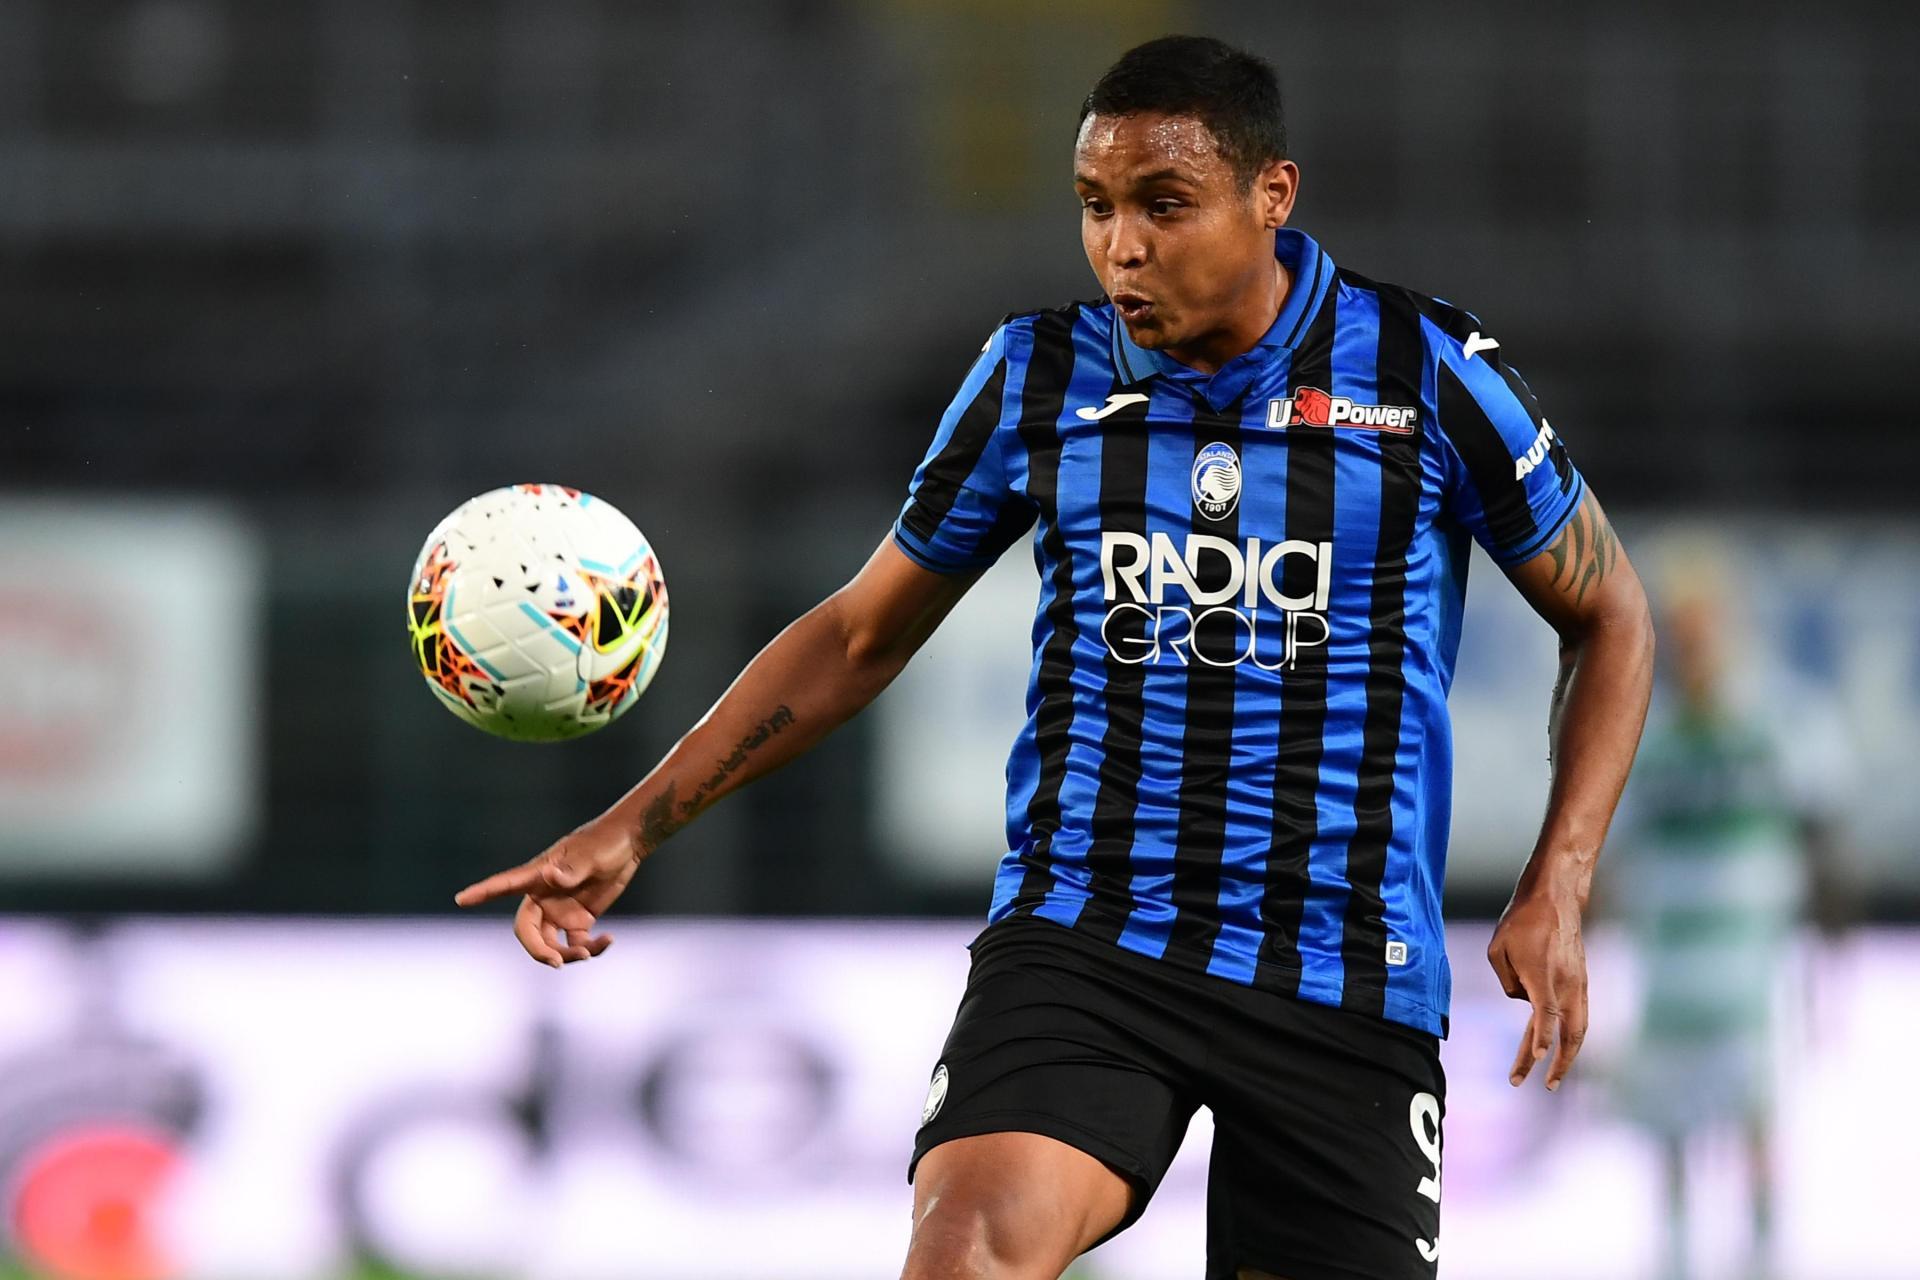 Atalanta striker Muriel out of hospital after head injury at home